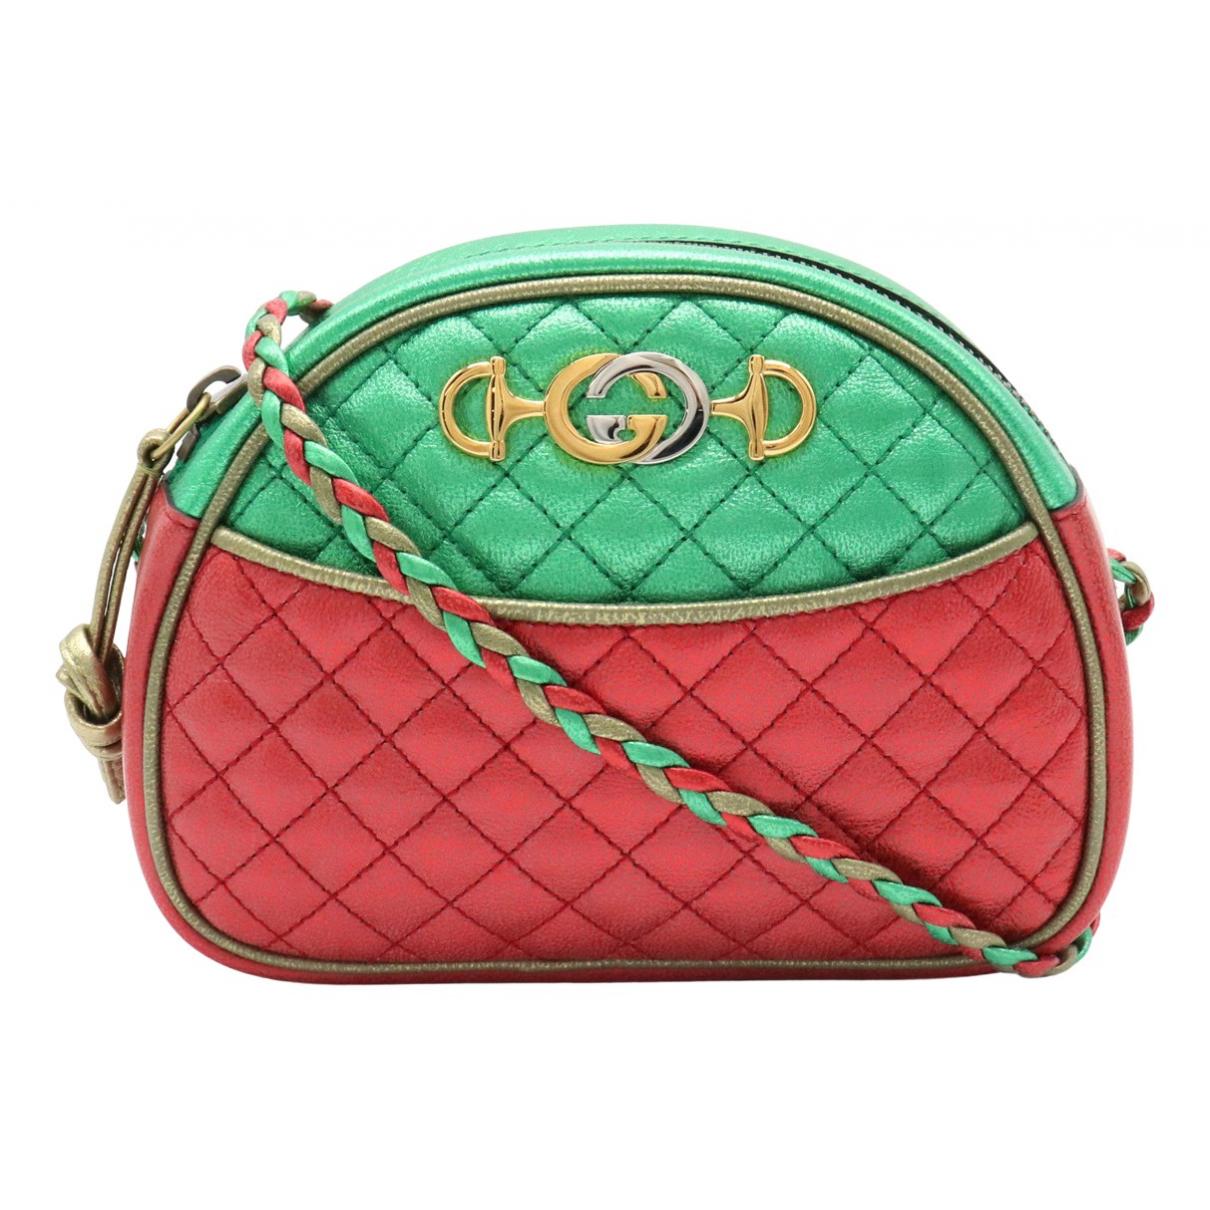 Gucci - Sac a main Laminated pour femme en cuir - multicolore